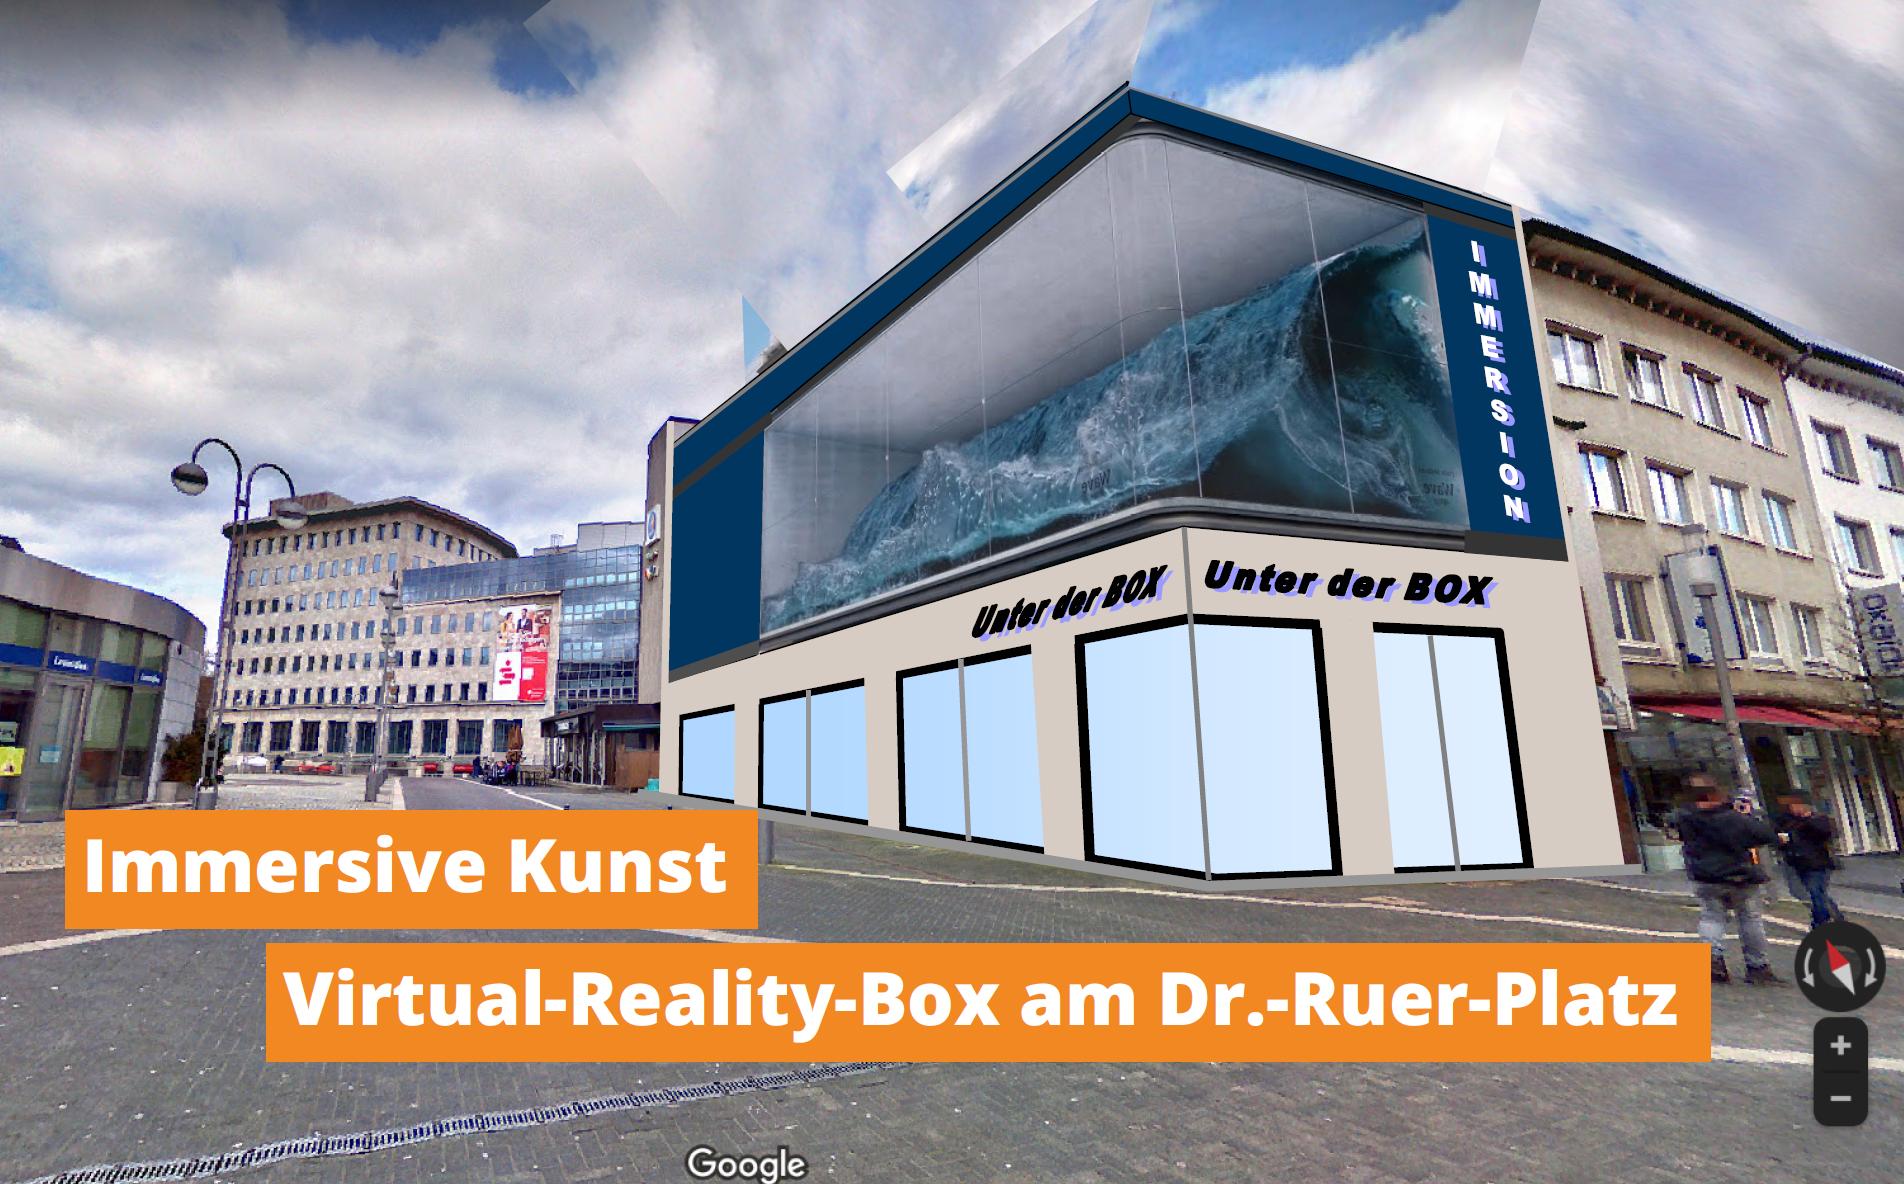 Riesige Virtual-Reality-Box auf dem Dr.-Ruer-Platz